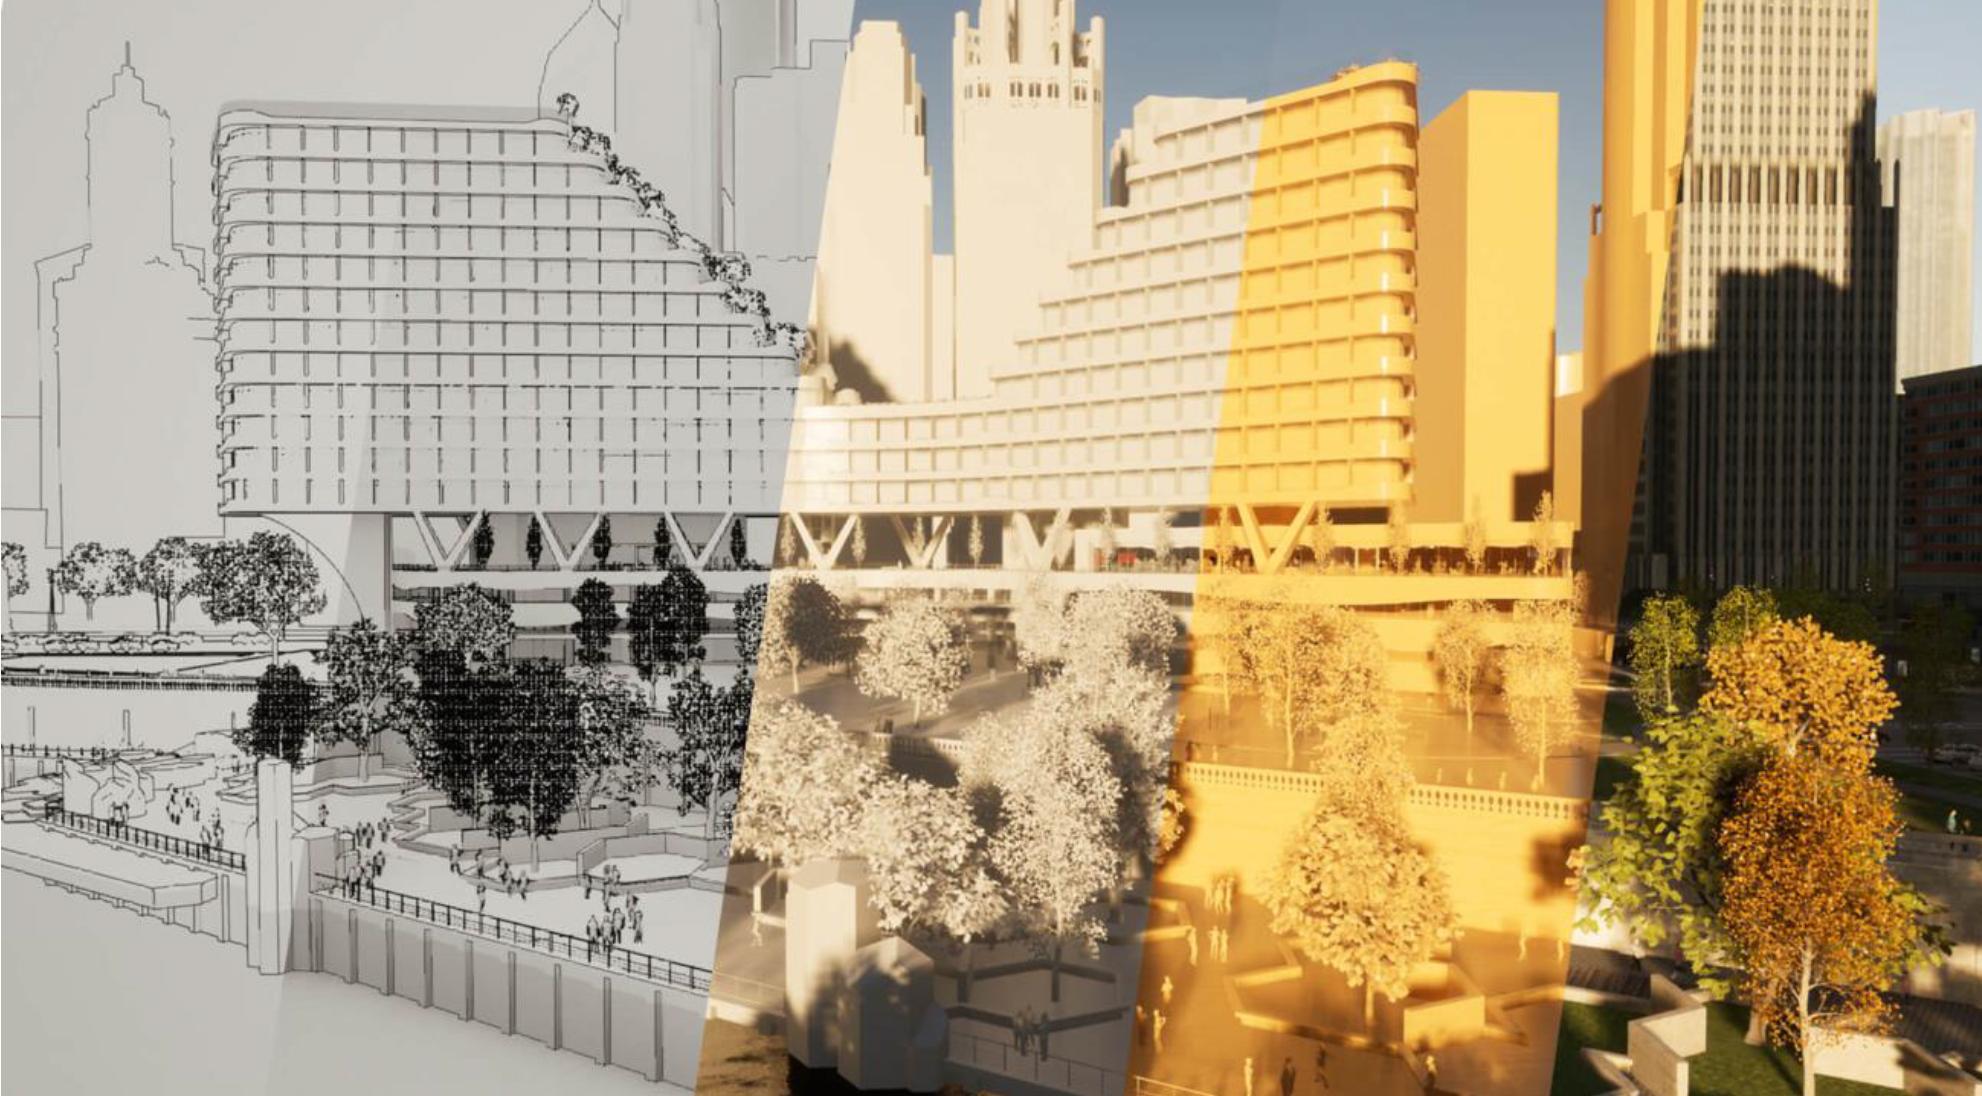 Twinmotion 2021.1 : Nonrealistic rendering styles